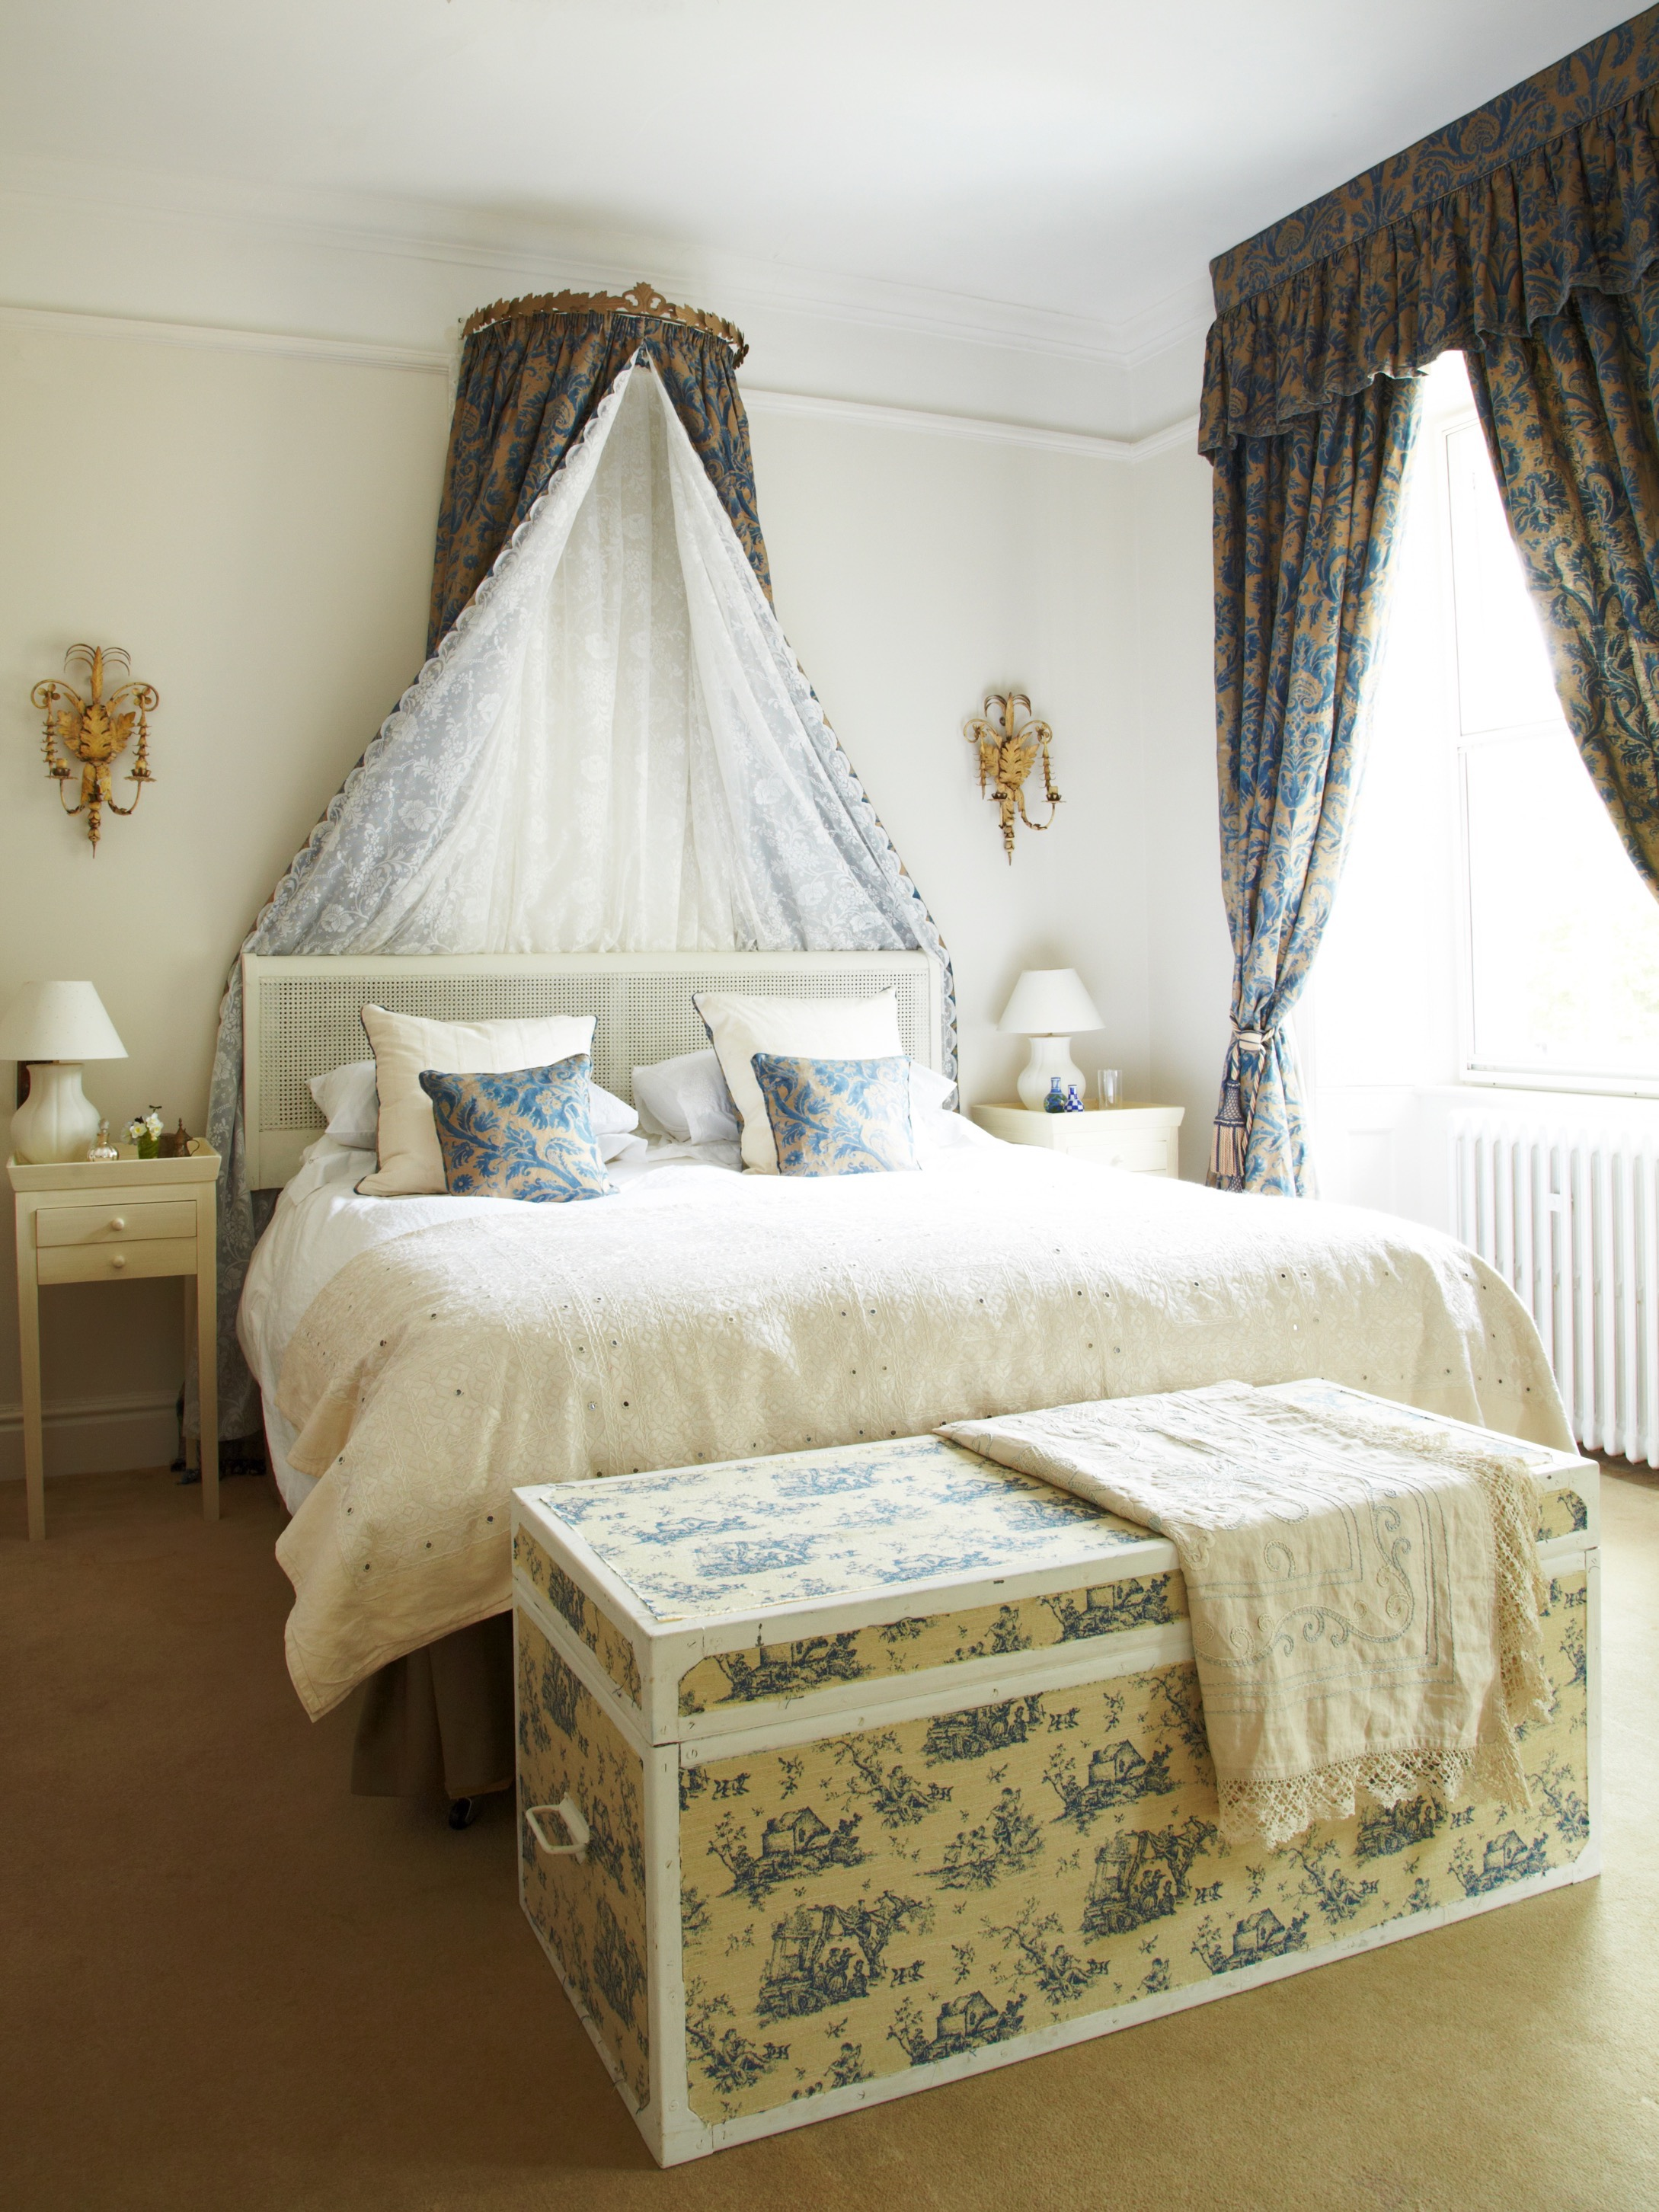 PoundonHouse_The_French_Room_Bridget_Pierson.jpg